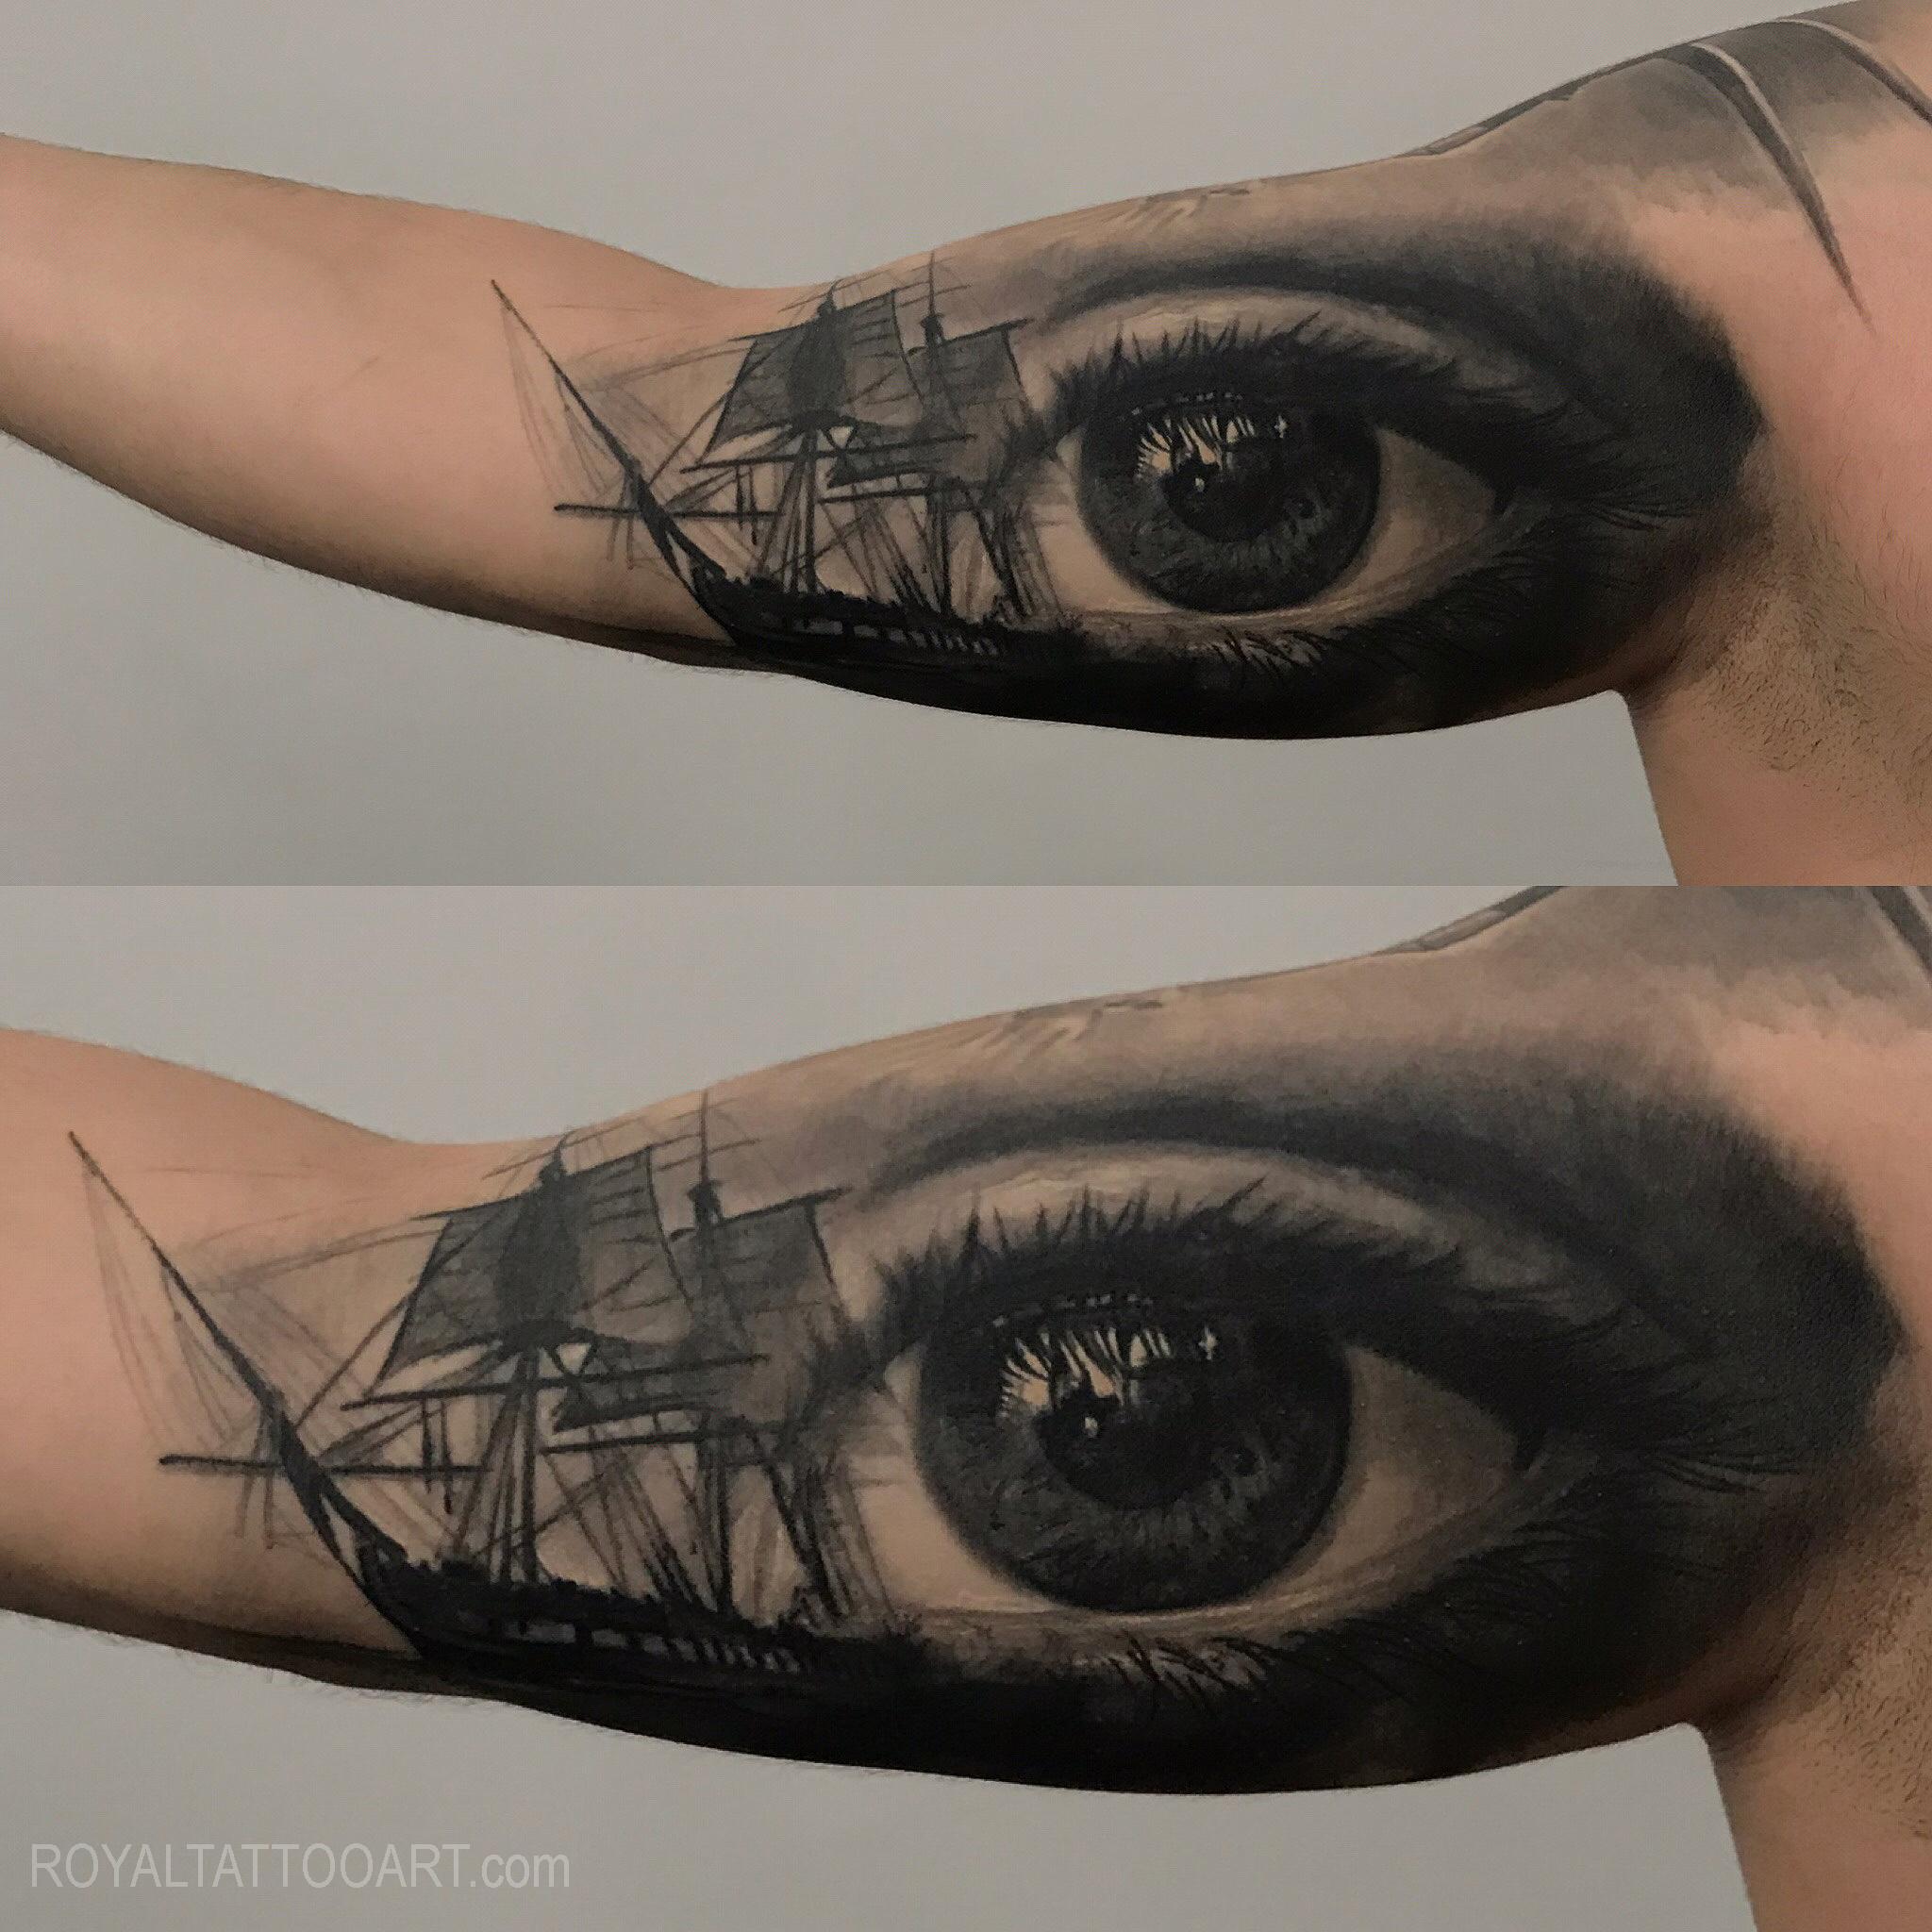 EYe tattoo inner arm black and grey realistic realism boat water seal .jpg